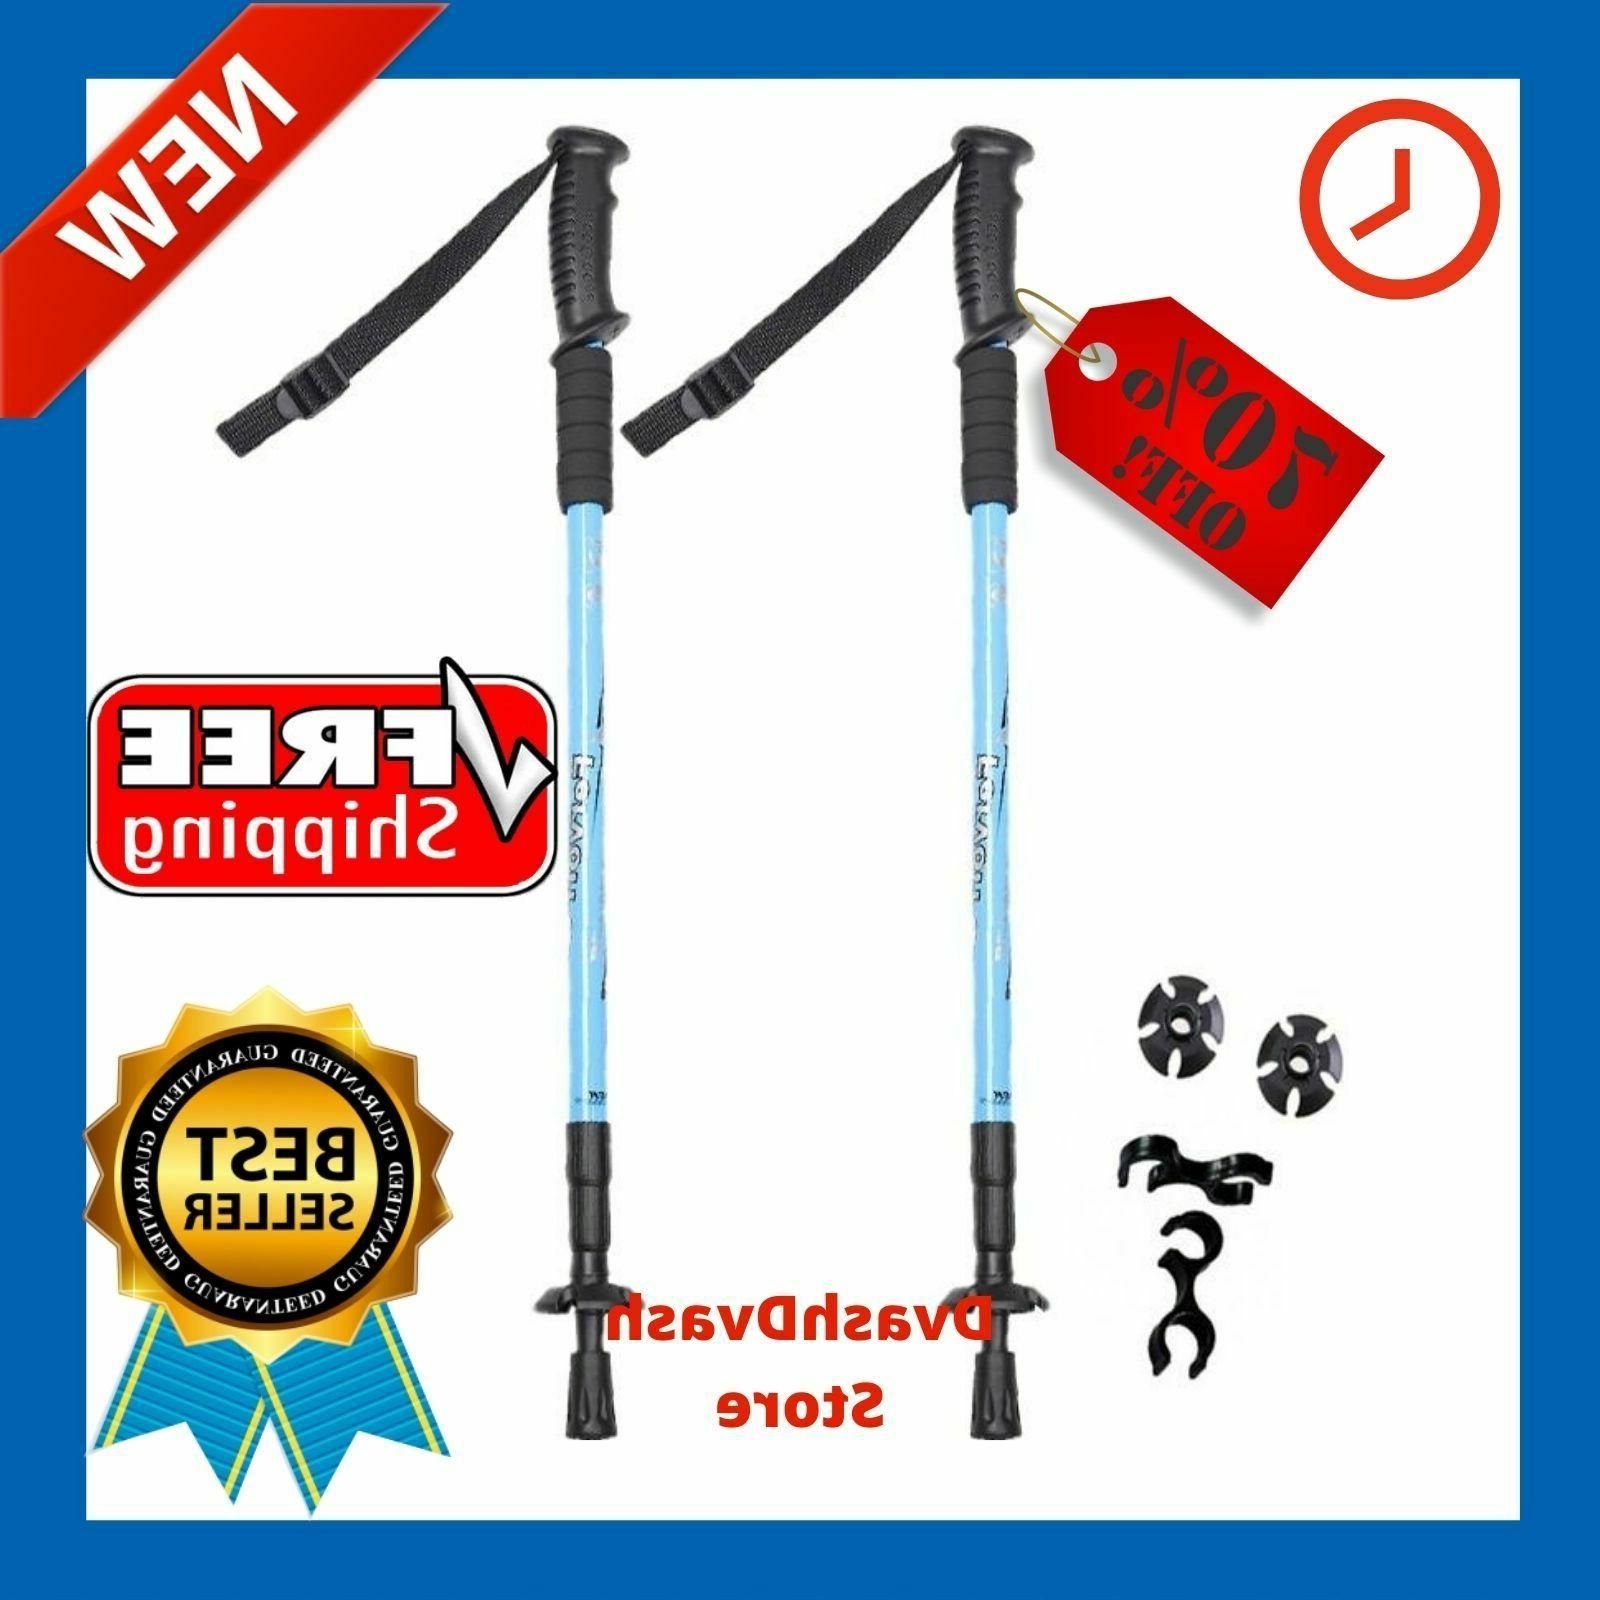 2 x anti shock walking sticks telescopic